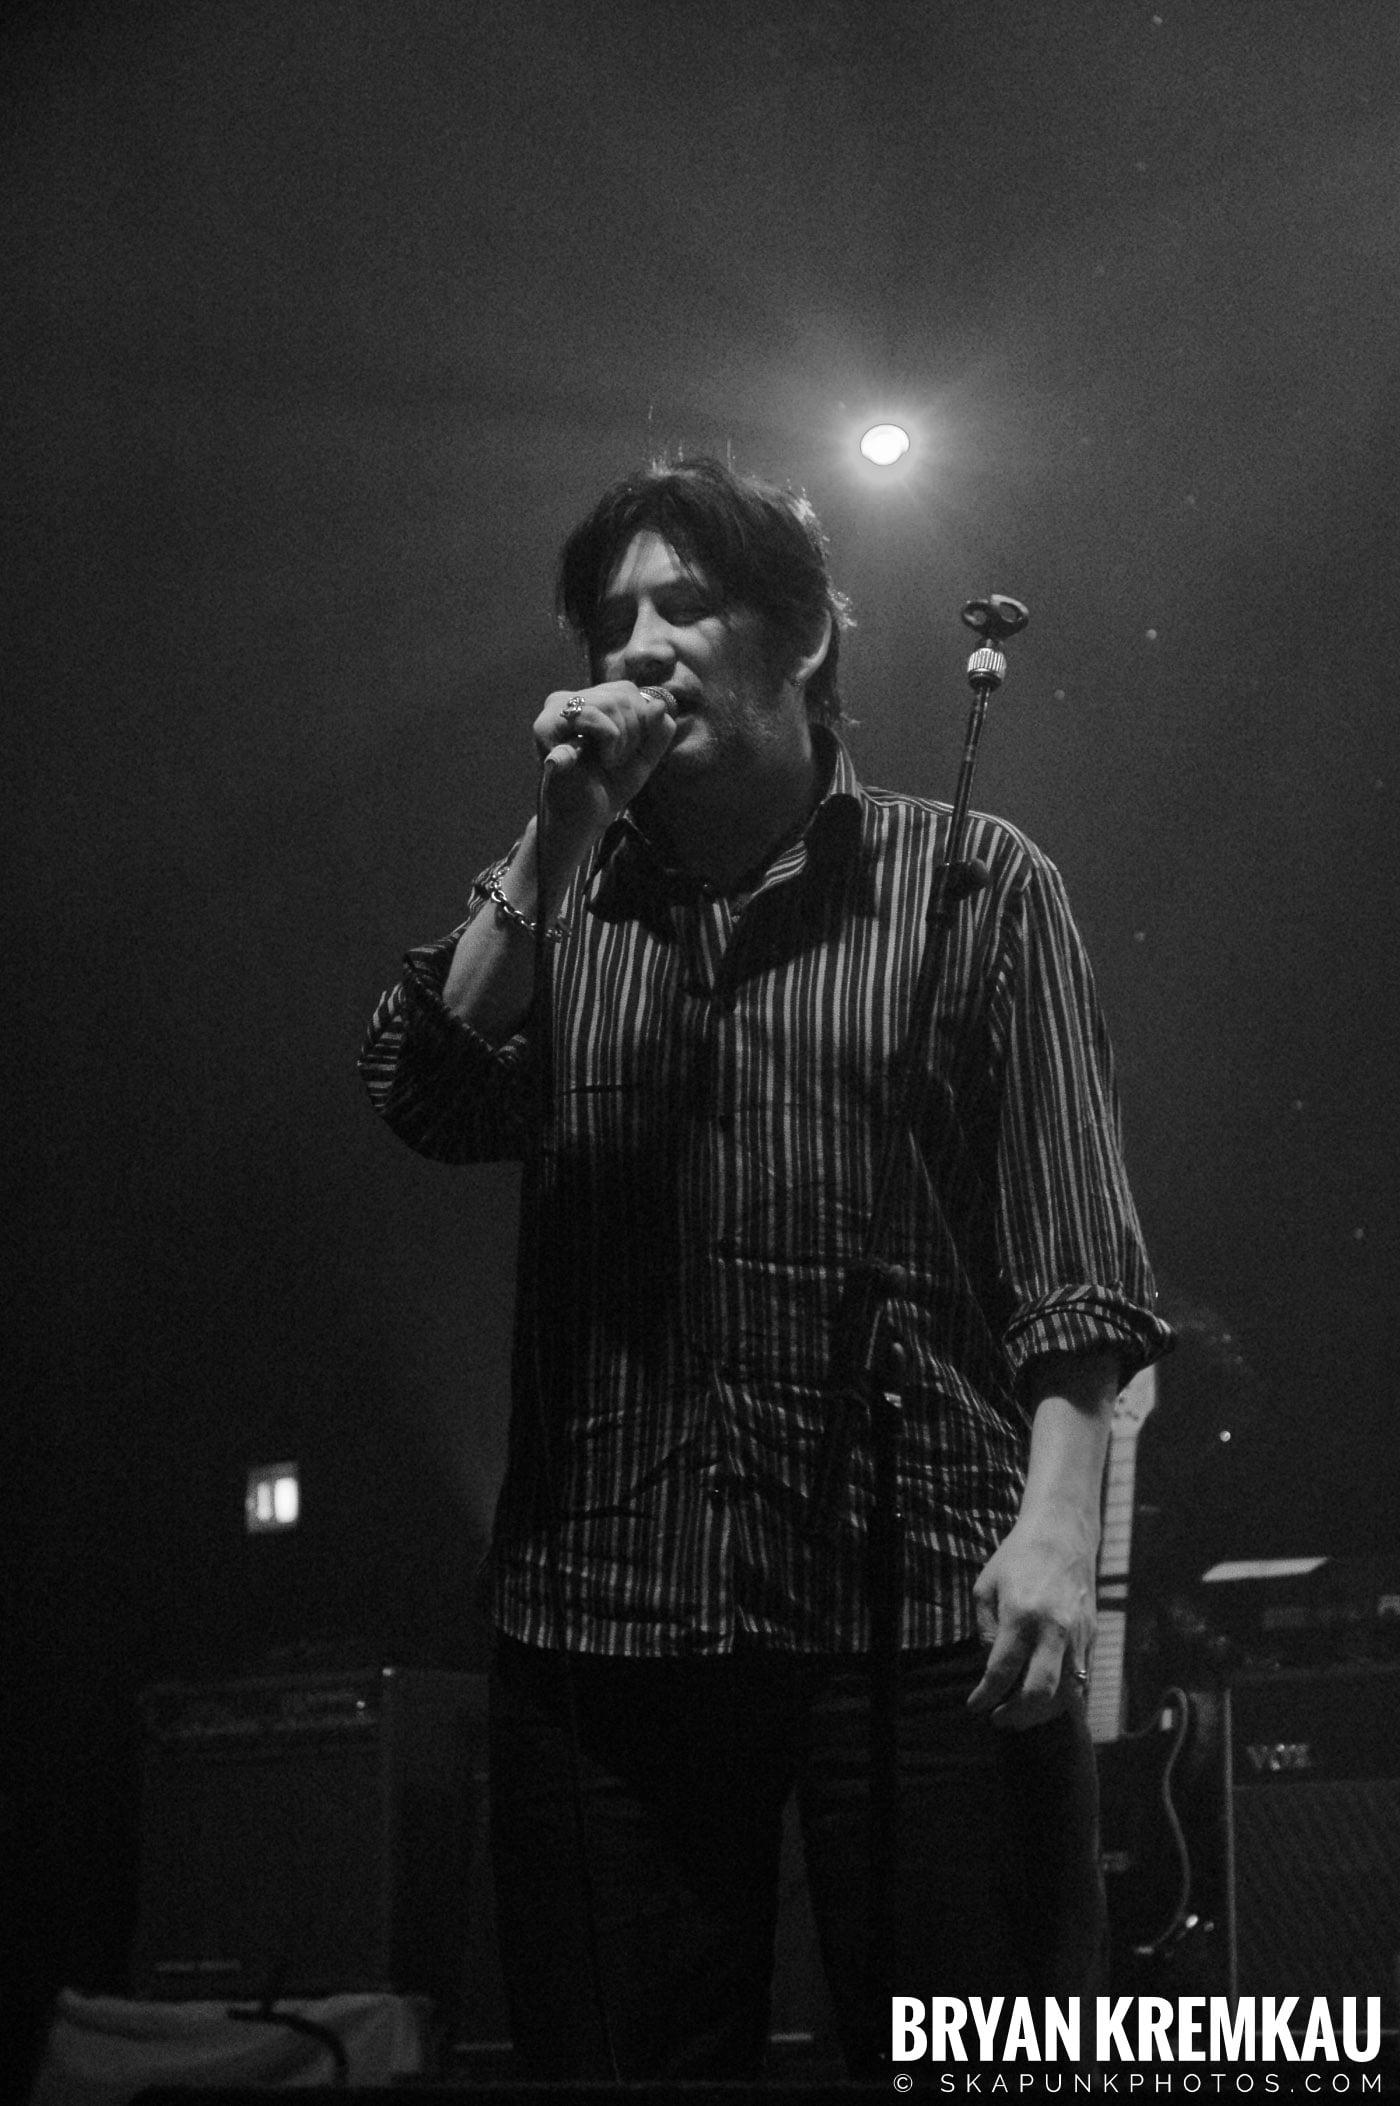 The Pogues @ Brixton Academy, London UK - 12.19.05 (6)